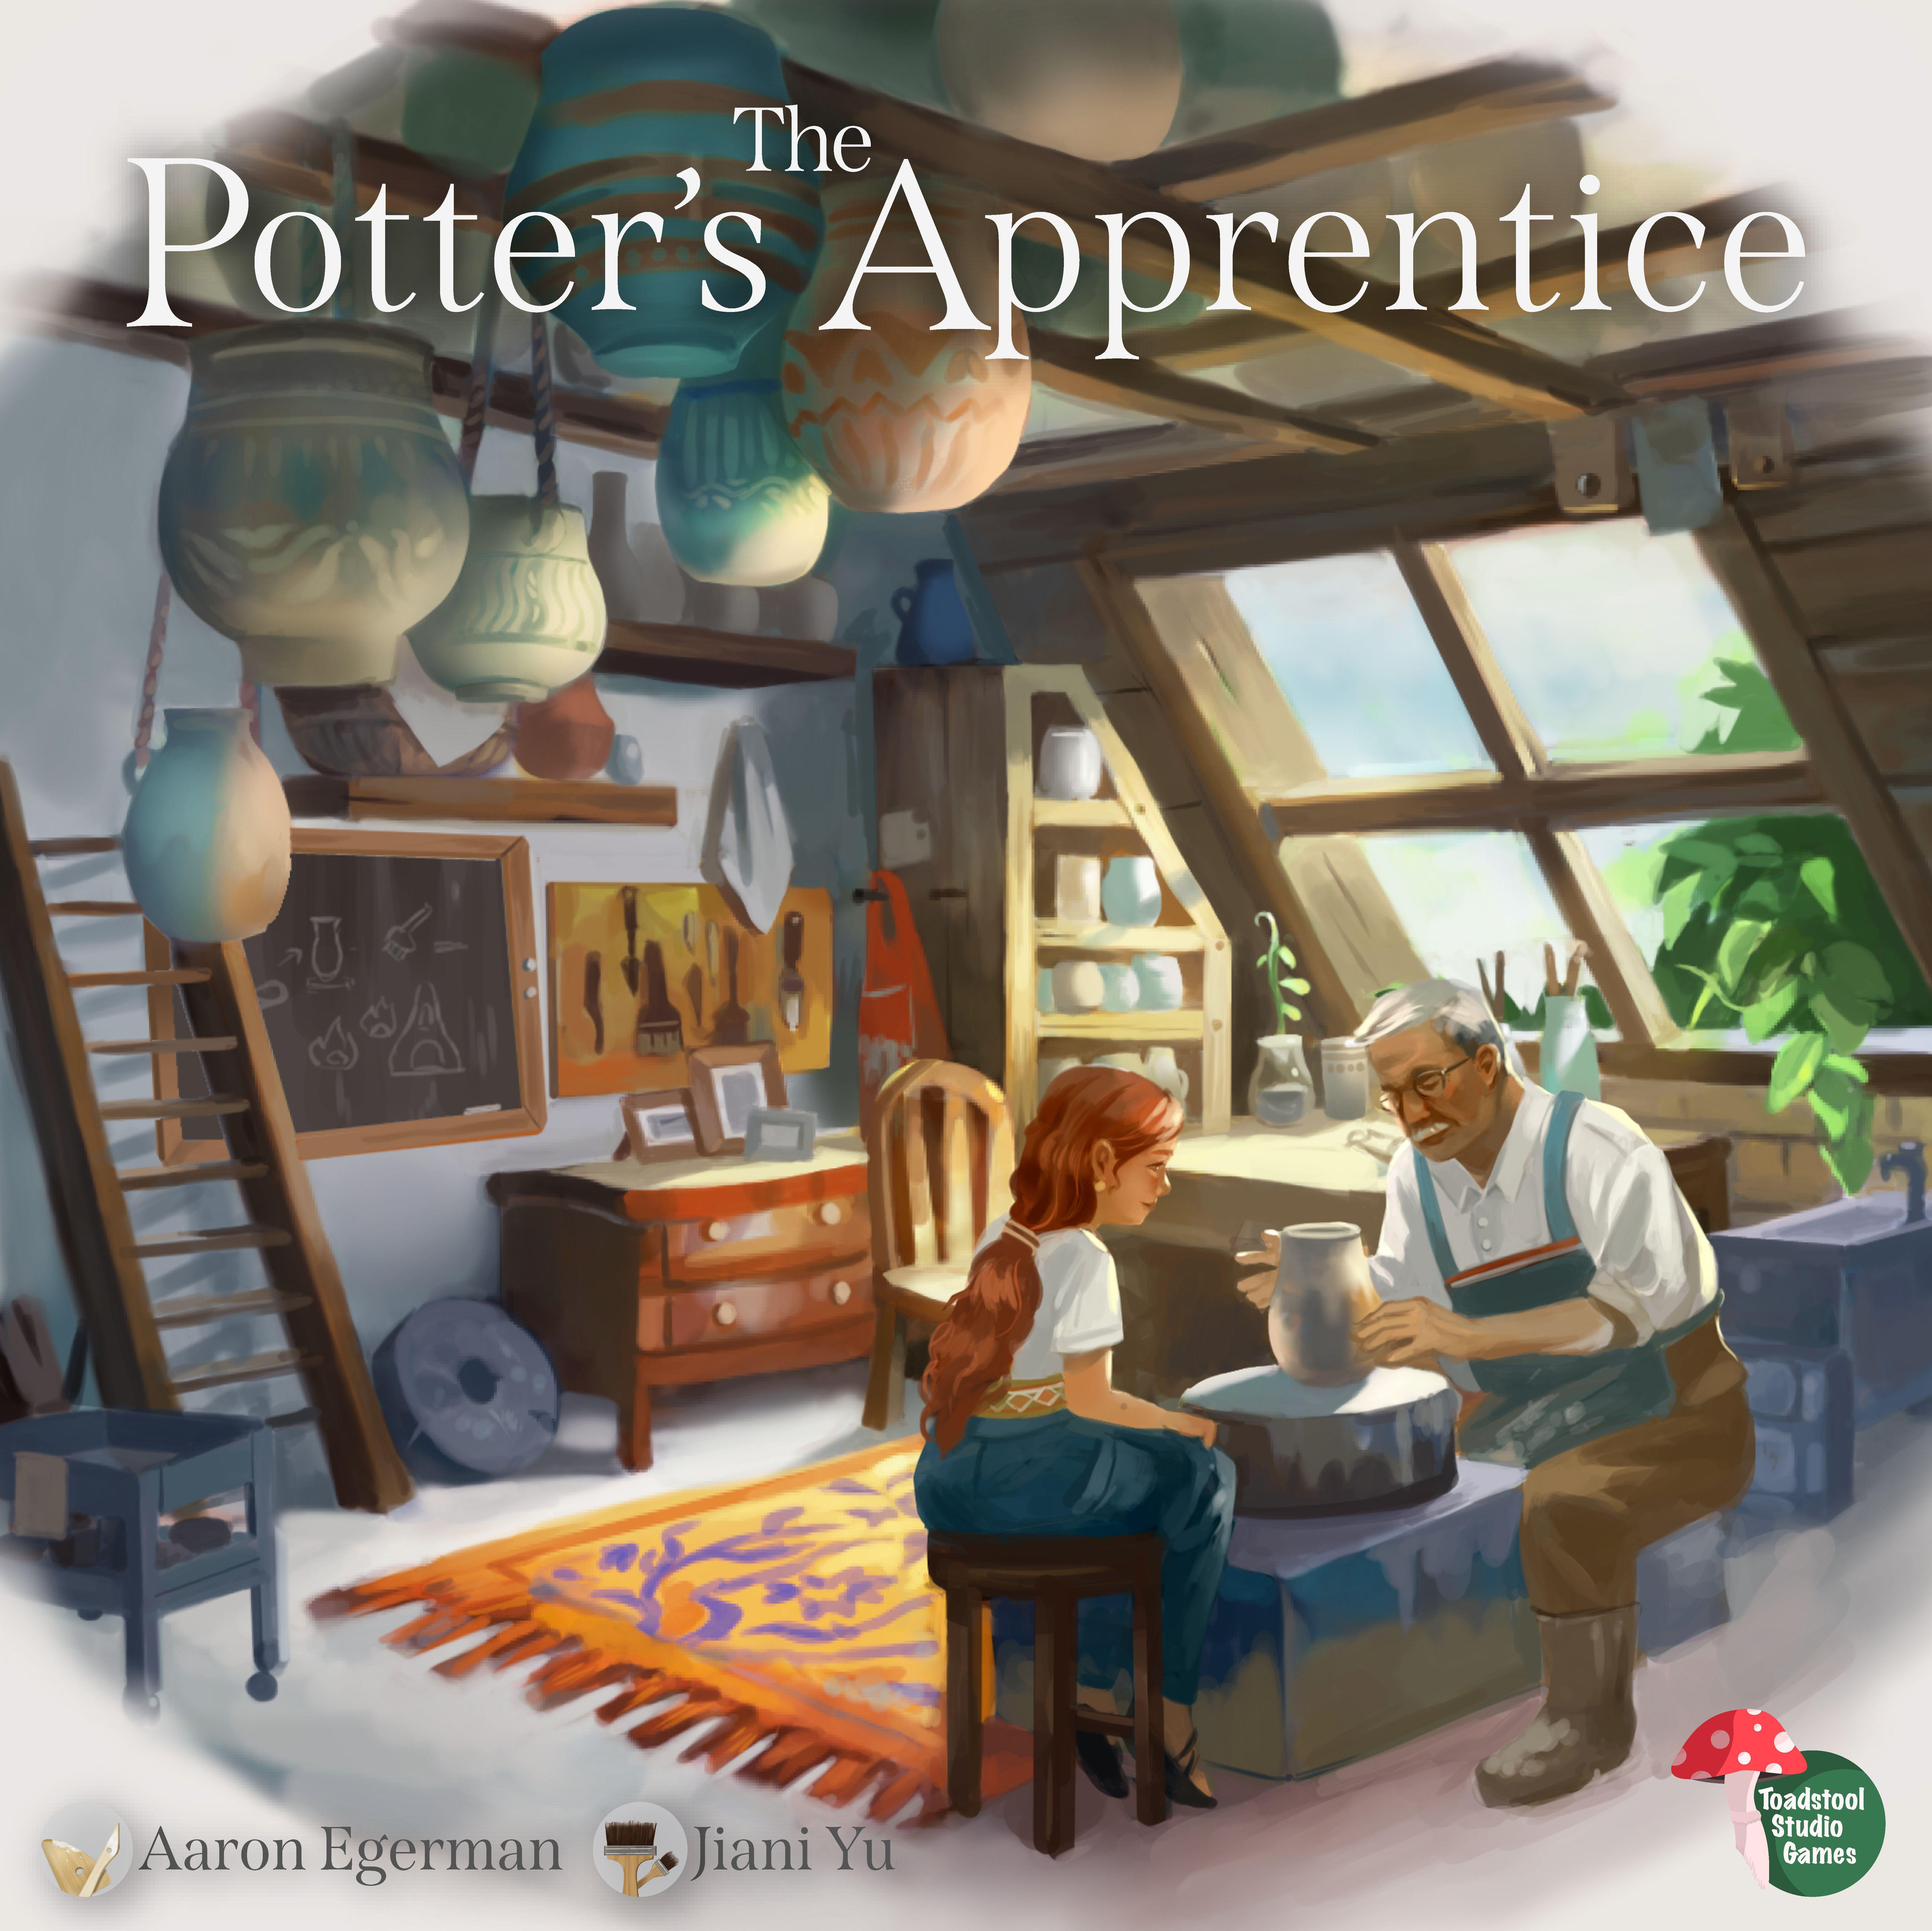 The Potter's Apprentice